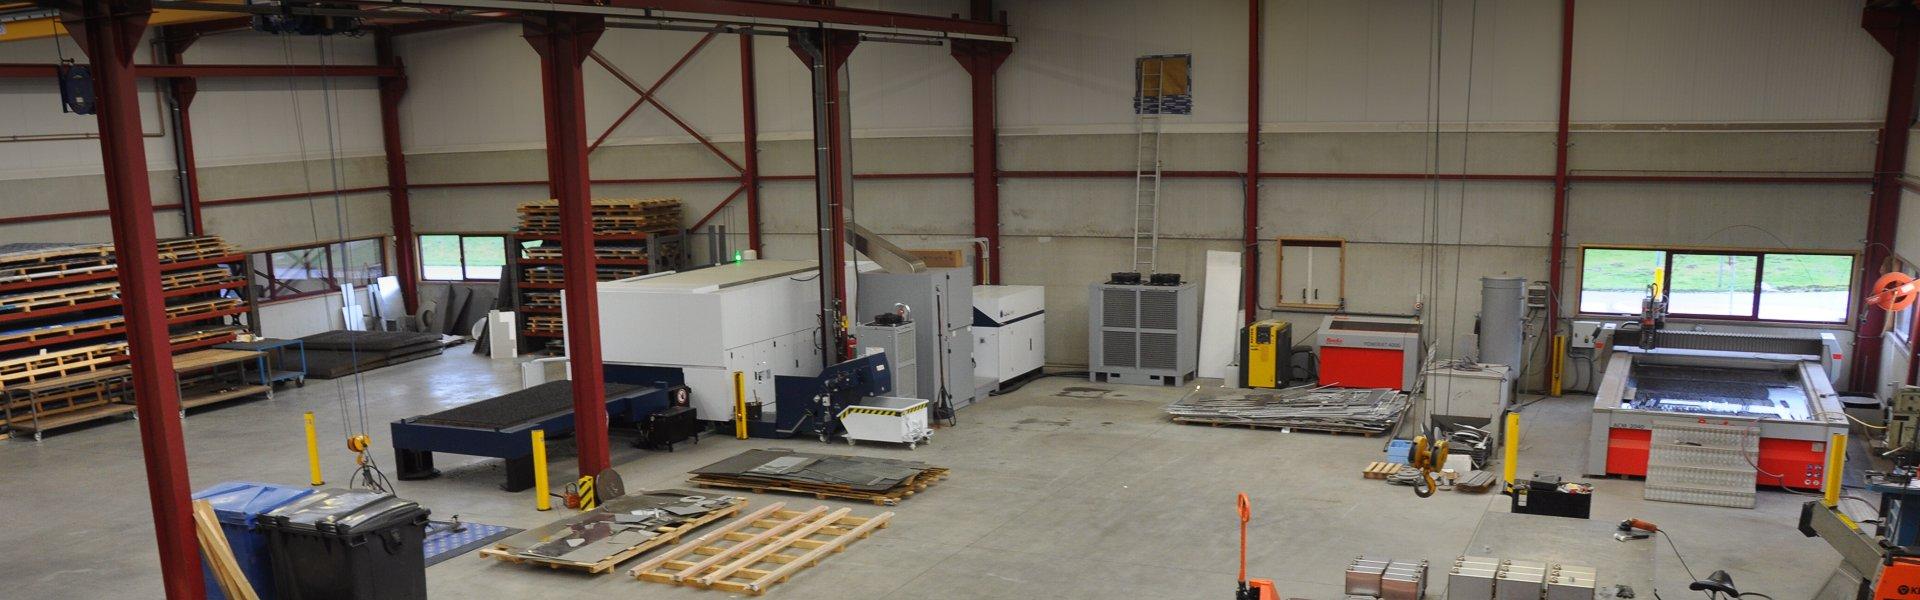 Werkplaats Hinnemen Engineering